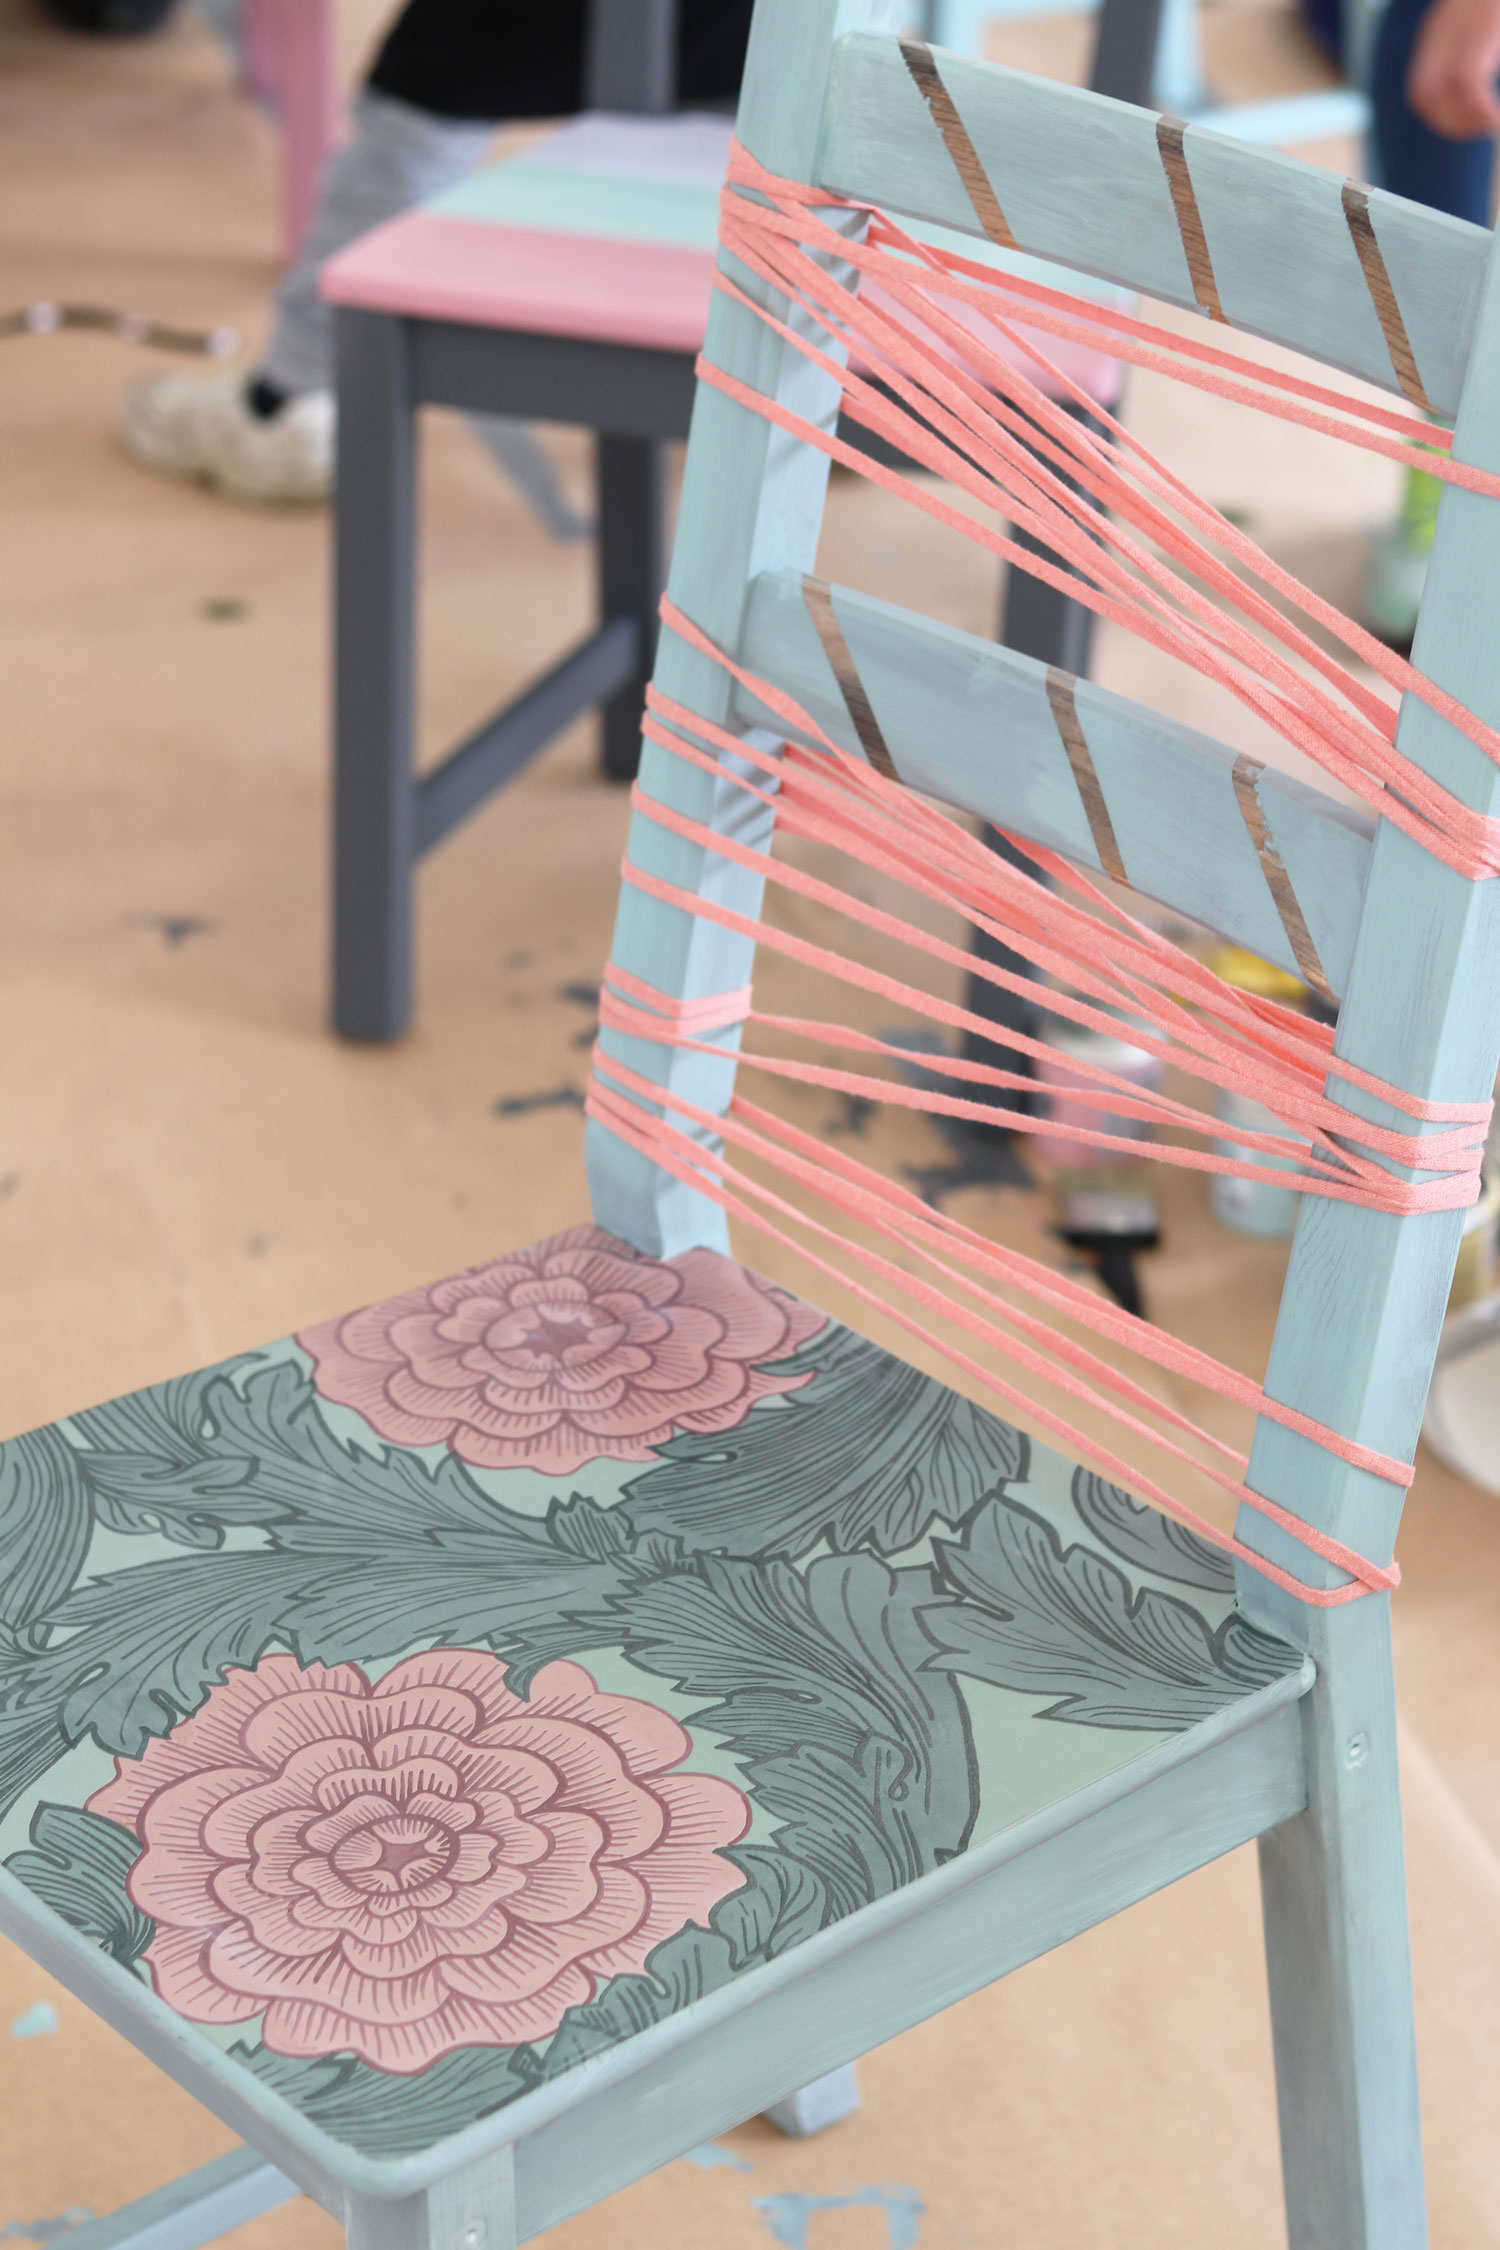 kreativa-karin-stol-med-tapet-midbec